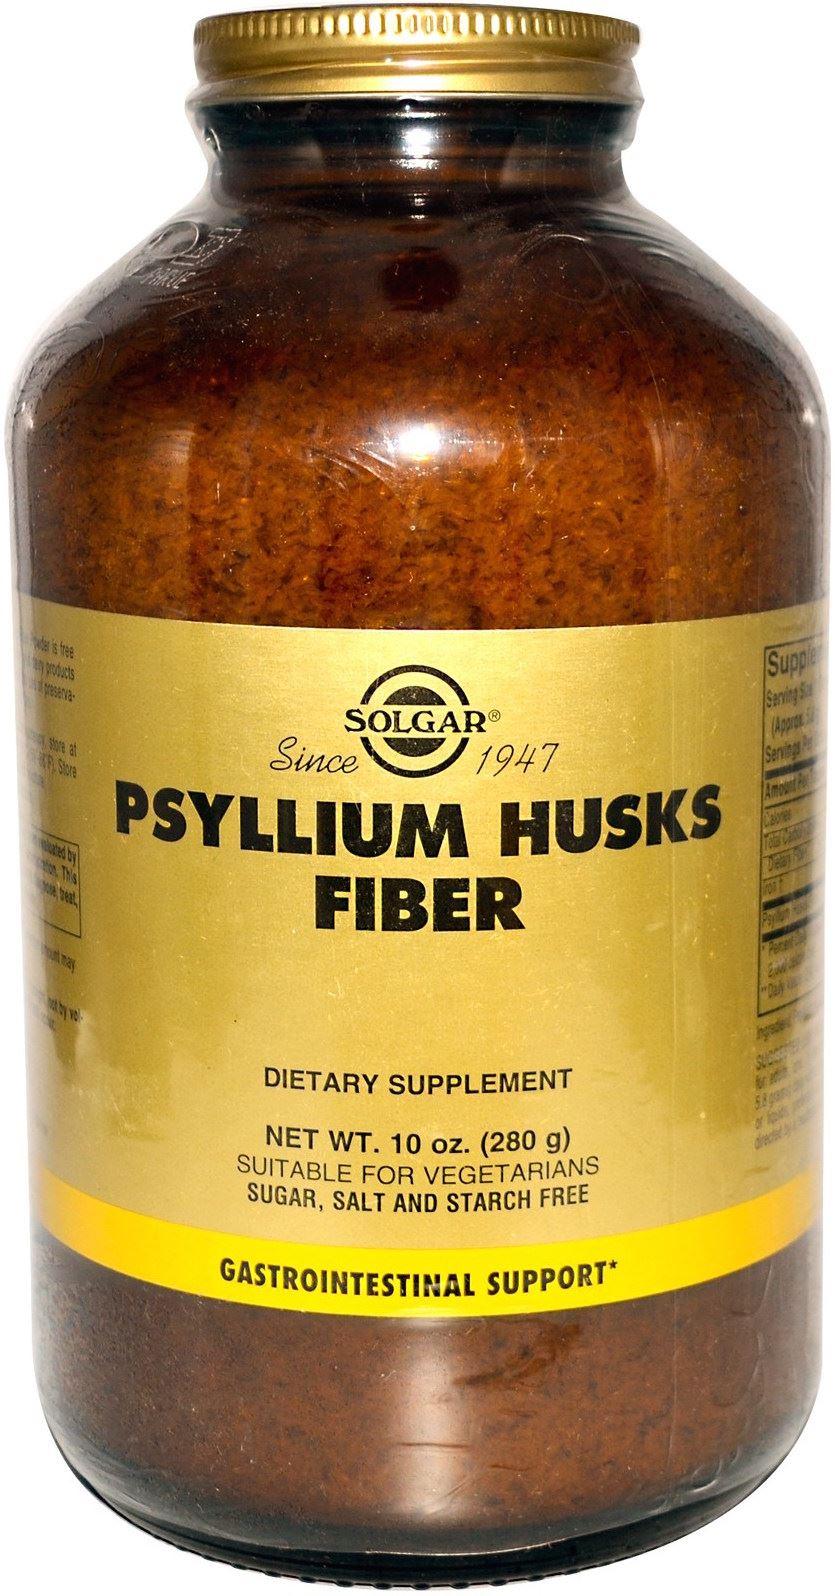 Solgar Psyllium Husks Fibre Powder 280gr Wefit